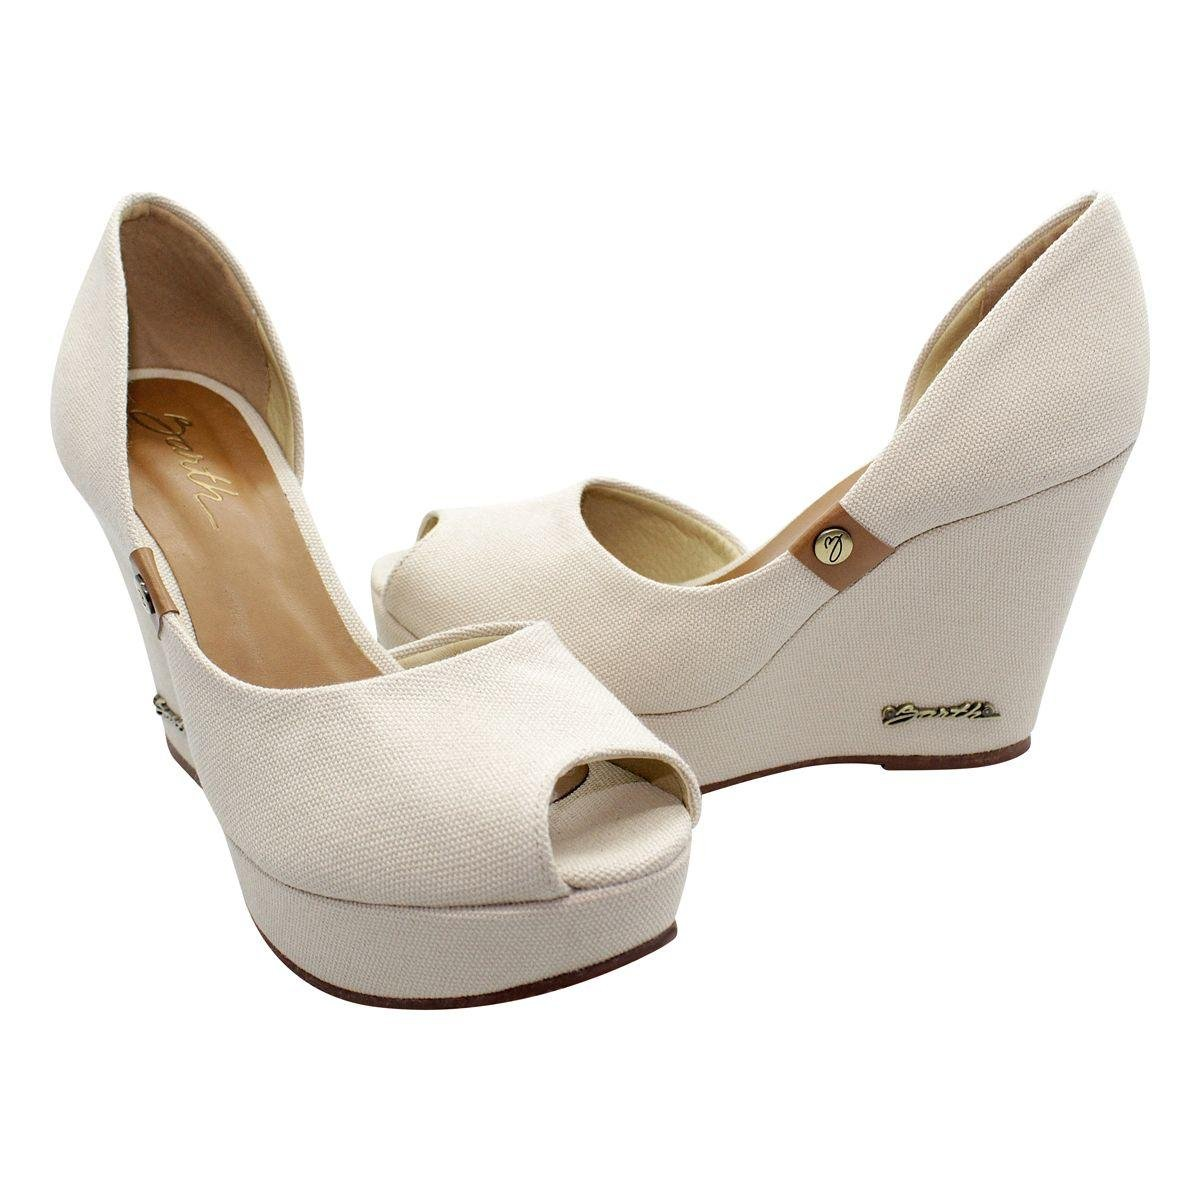 Areia Barth Shoes Areia Noite Shoes Noite Barth Areia Sapato Noite Shoes Barth Sapato Sapato Cnaq5n4